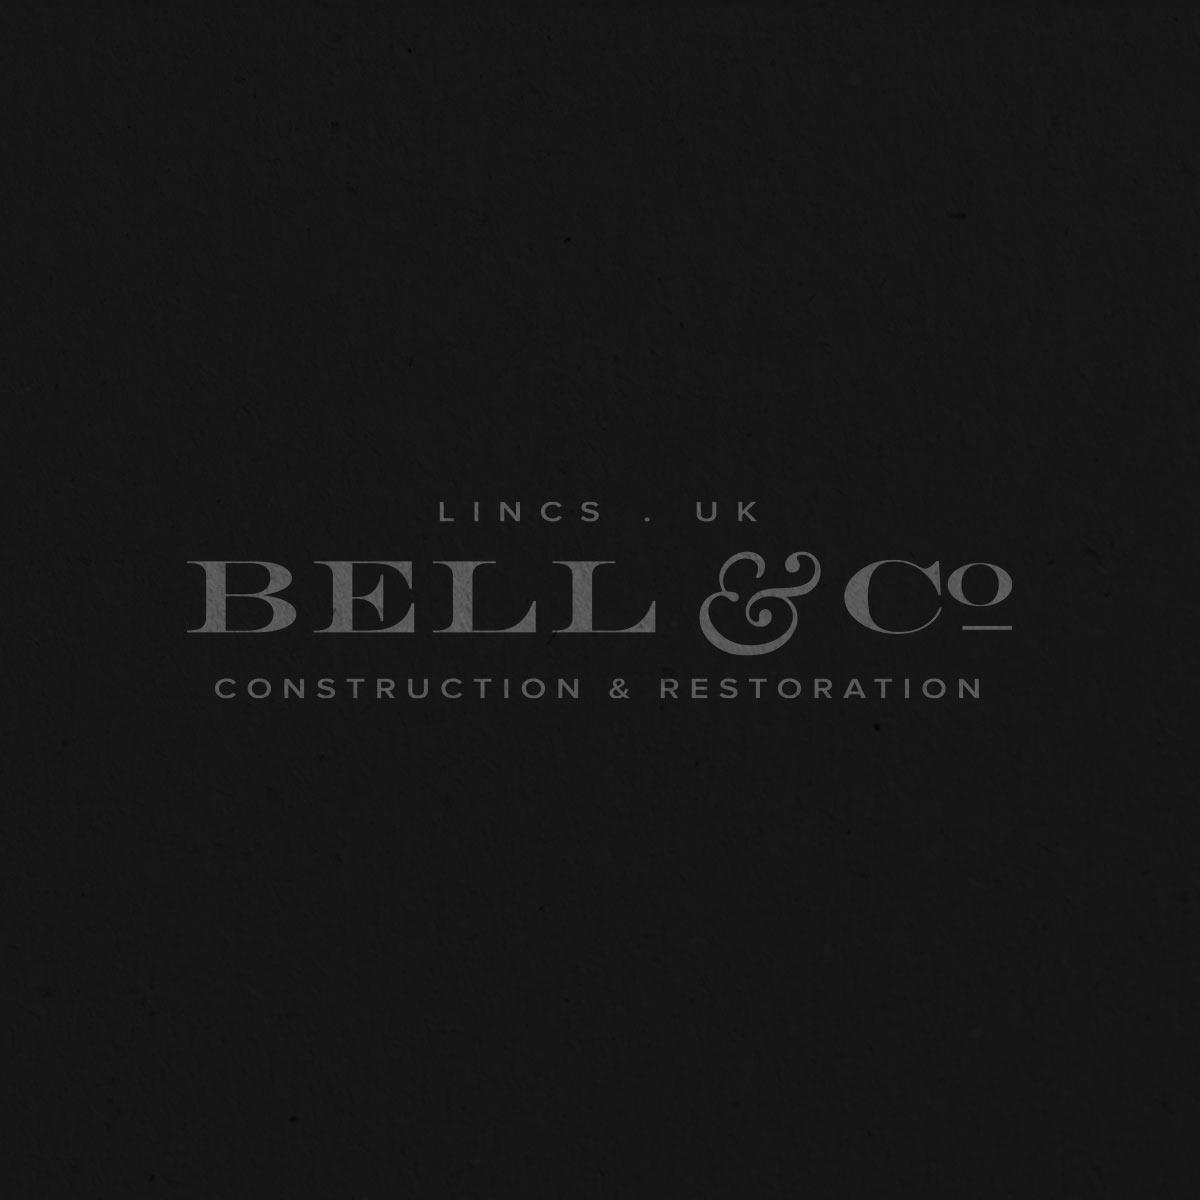 Bell & Co. Ltd